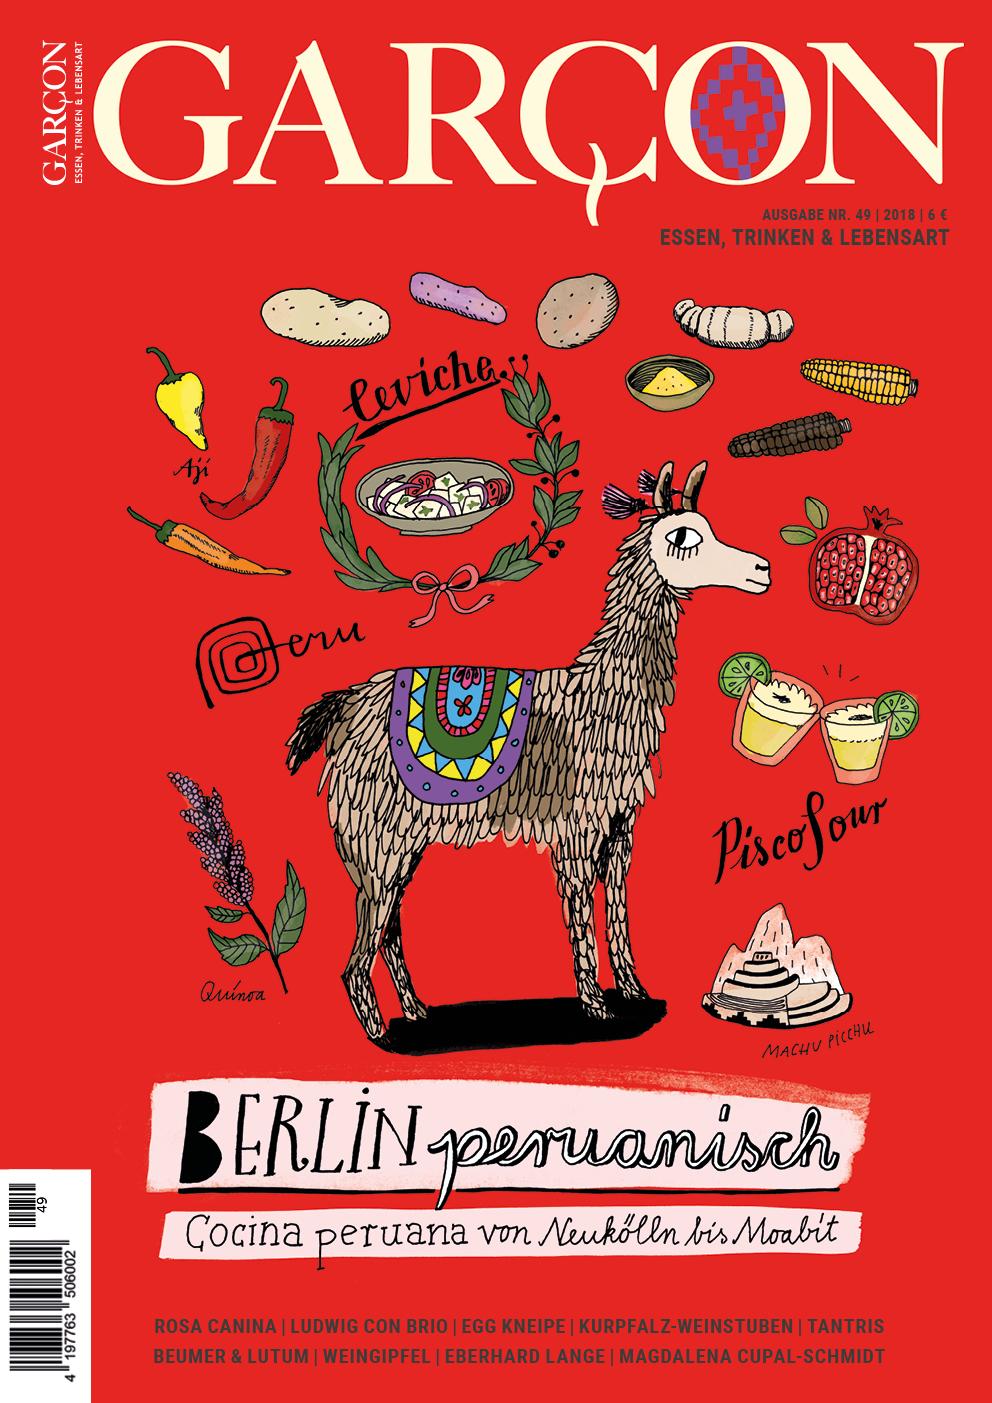 Magazin GARCON - Essen, Trinken, Lebensart Nr. 49 - Cover